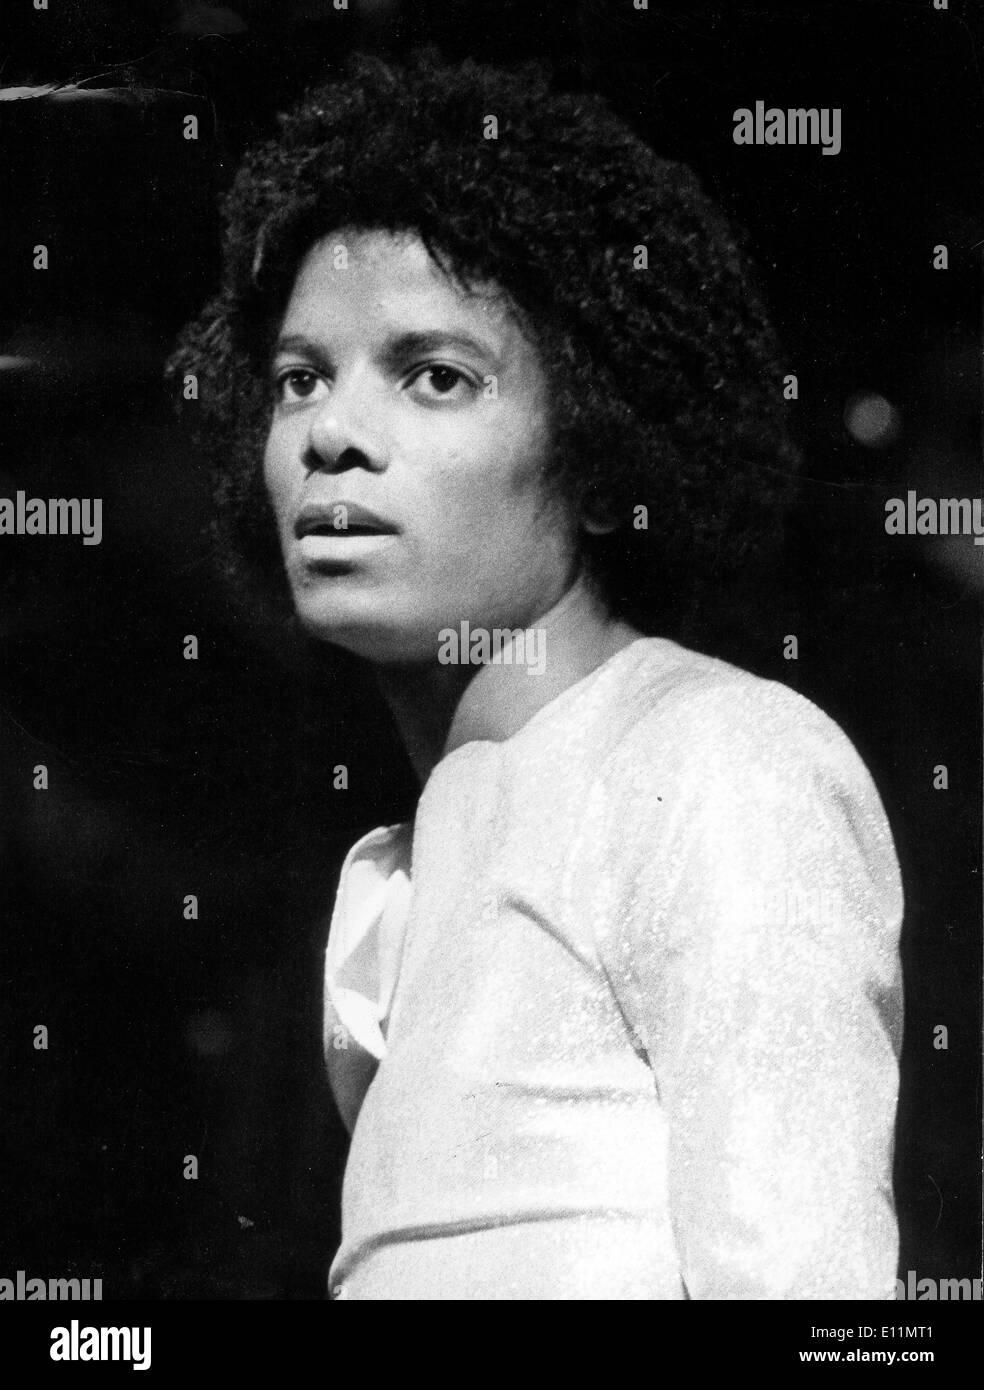 Michael Jackson before first Jackson 5 concert - Stock Image